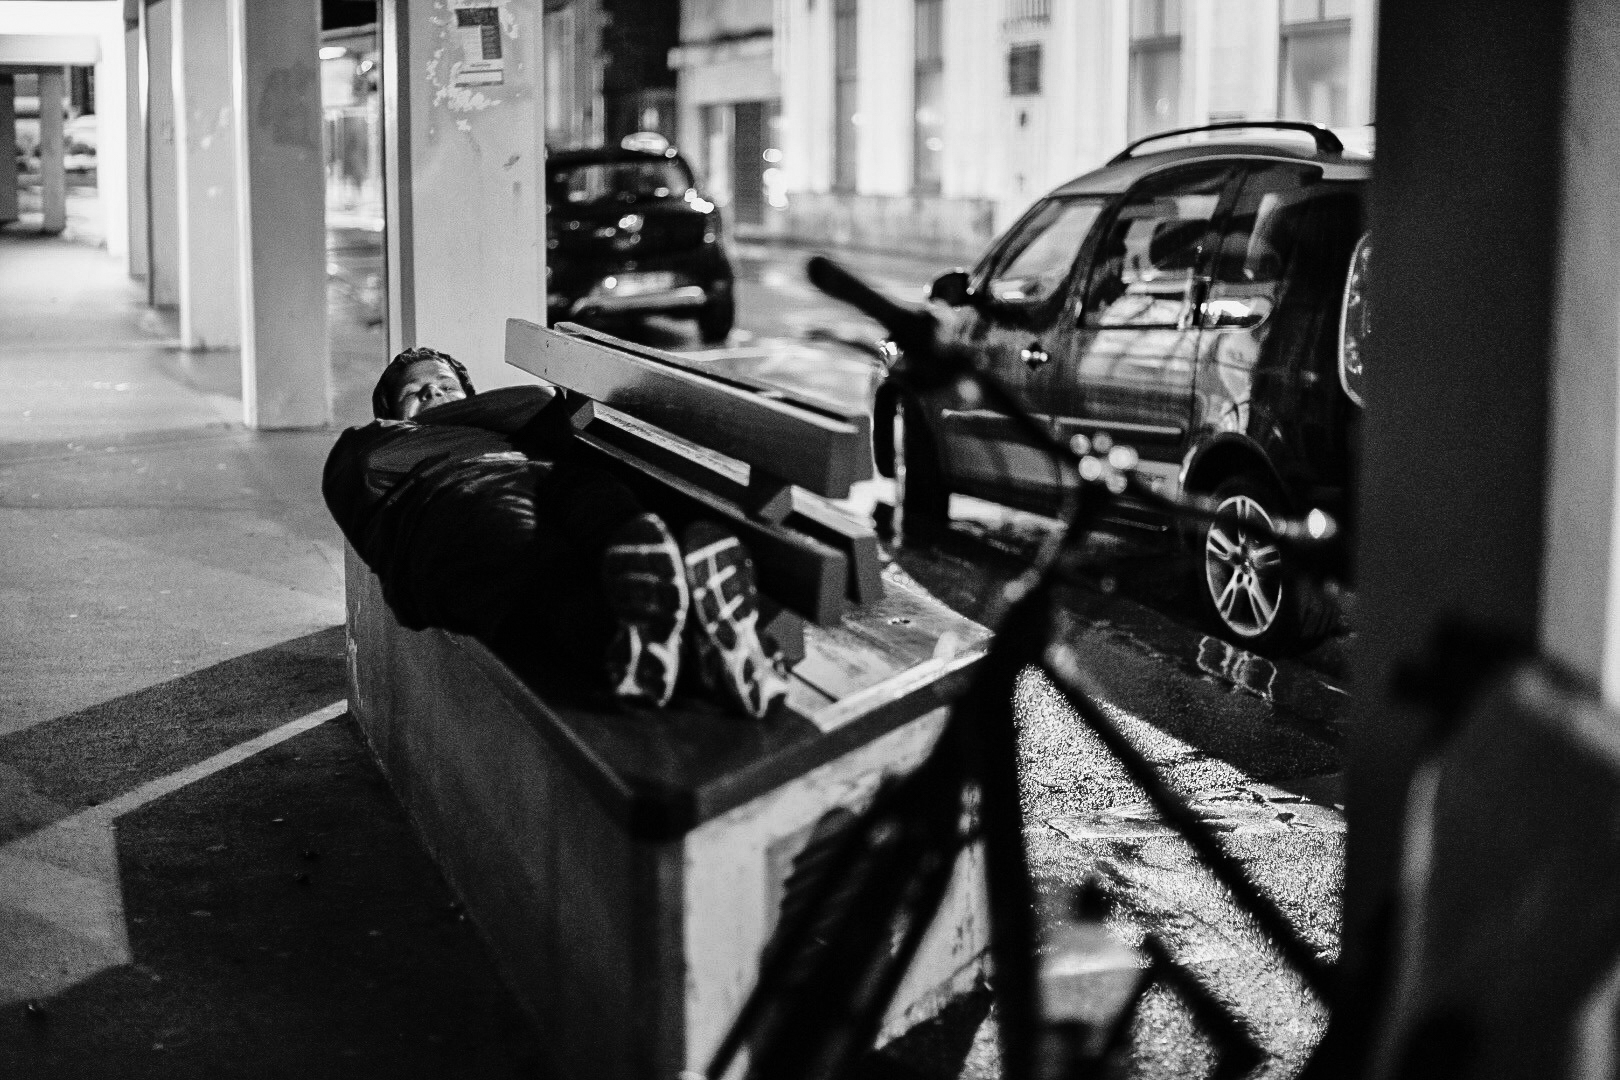 Tom_Oliver_Payne_London_to_Paris_Cycle-7.jpg